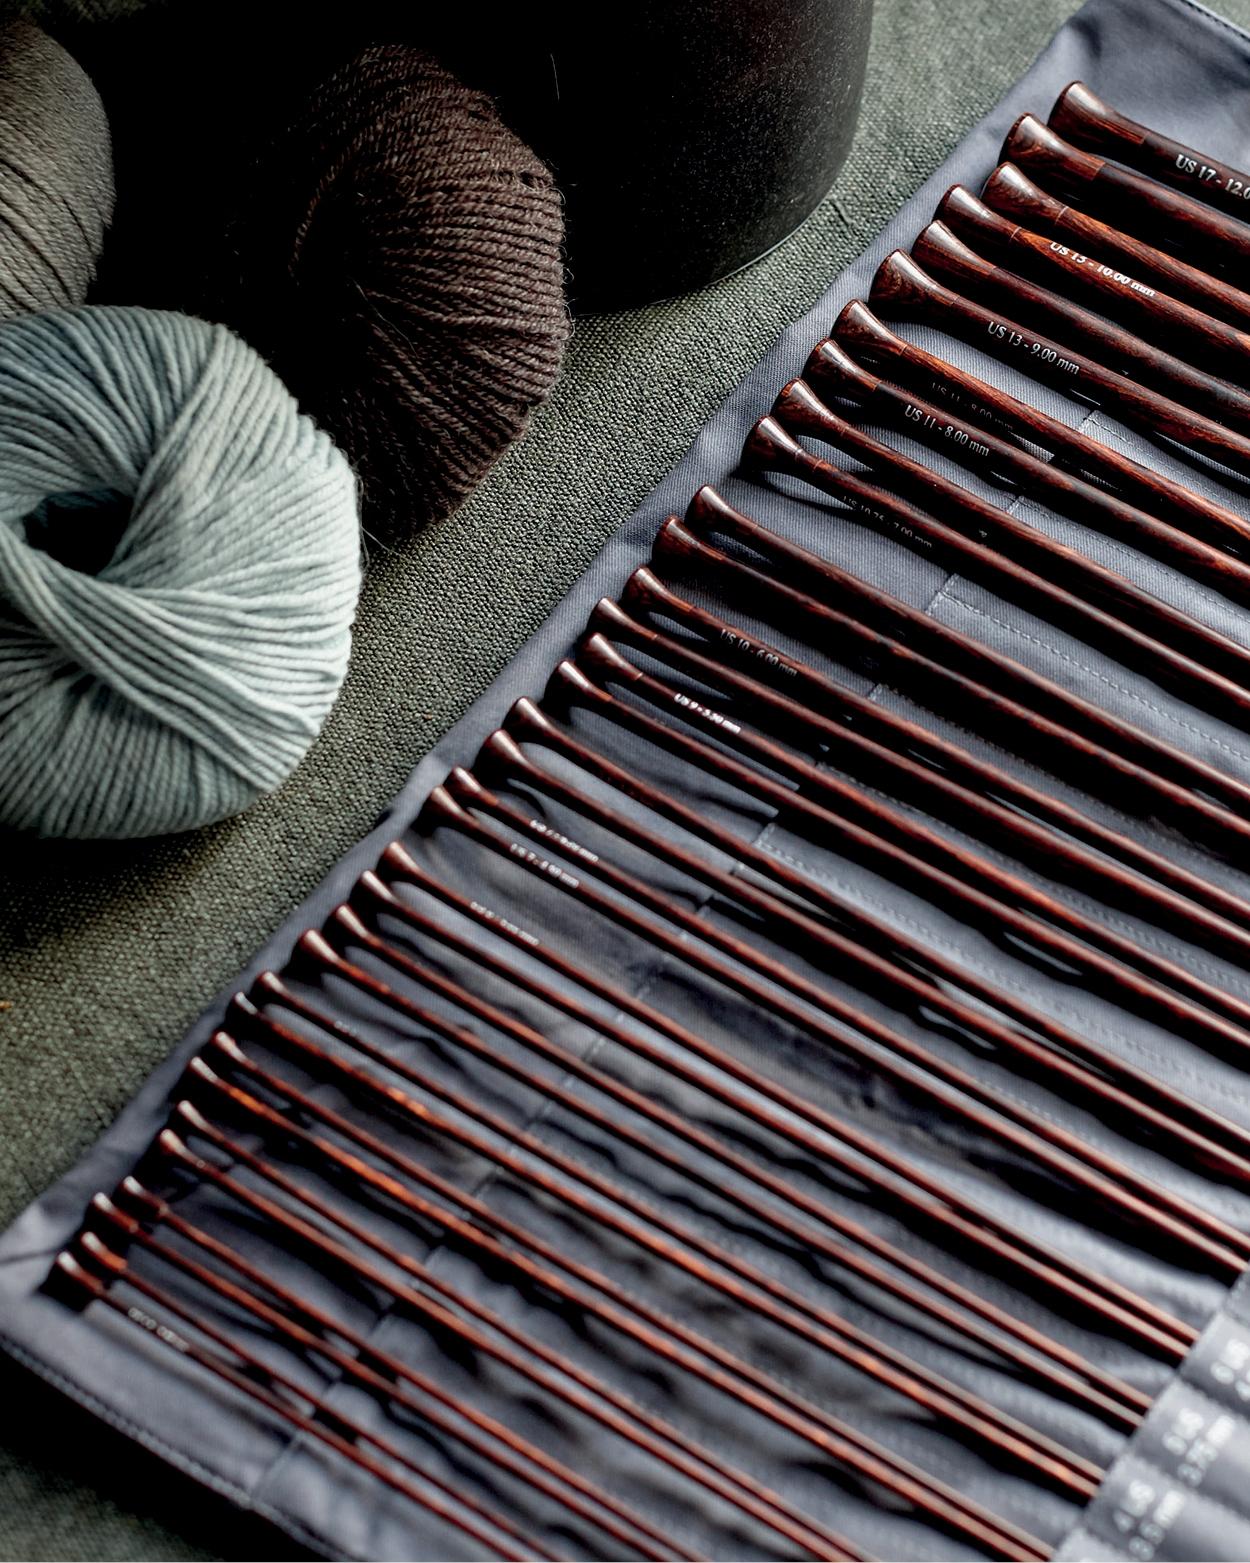 Rowan Single Point Knitting Needles